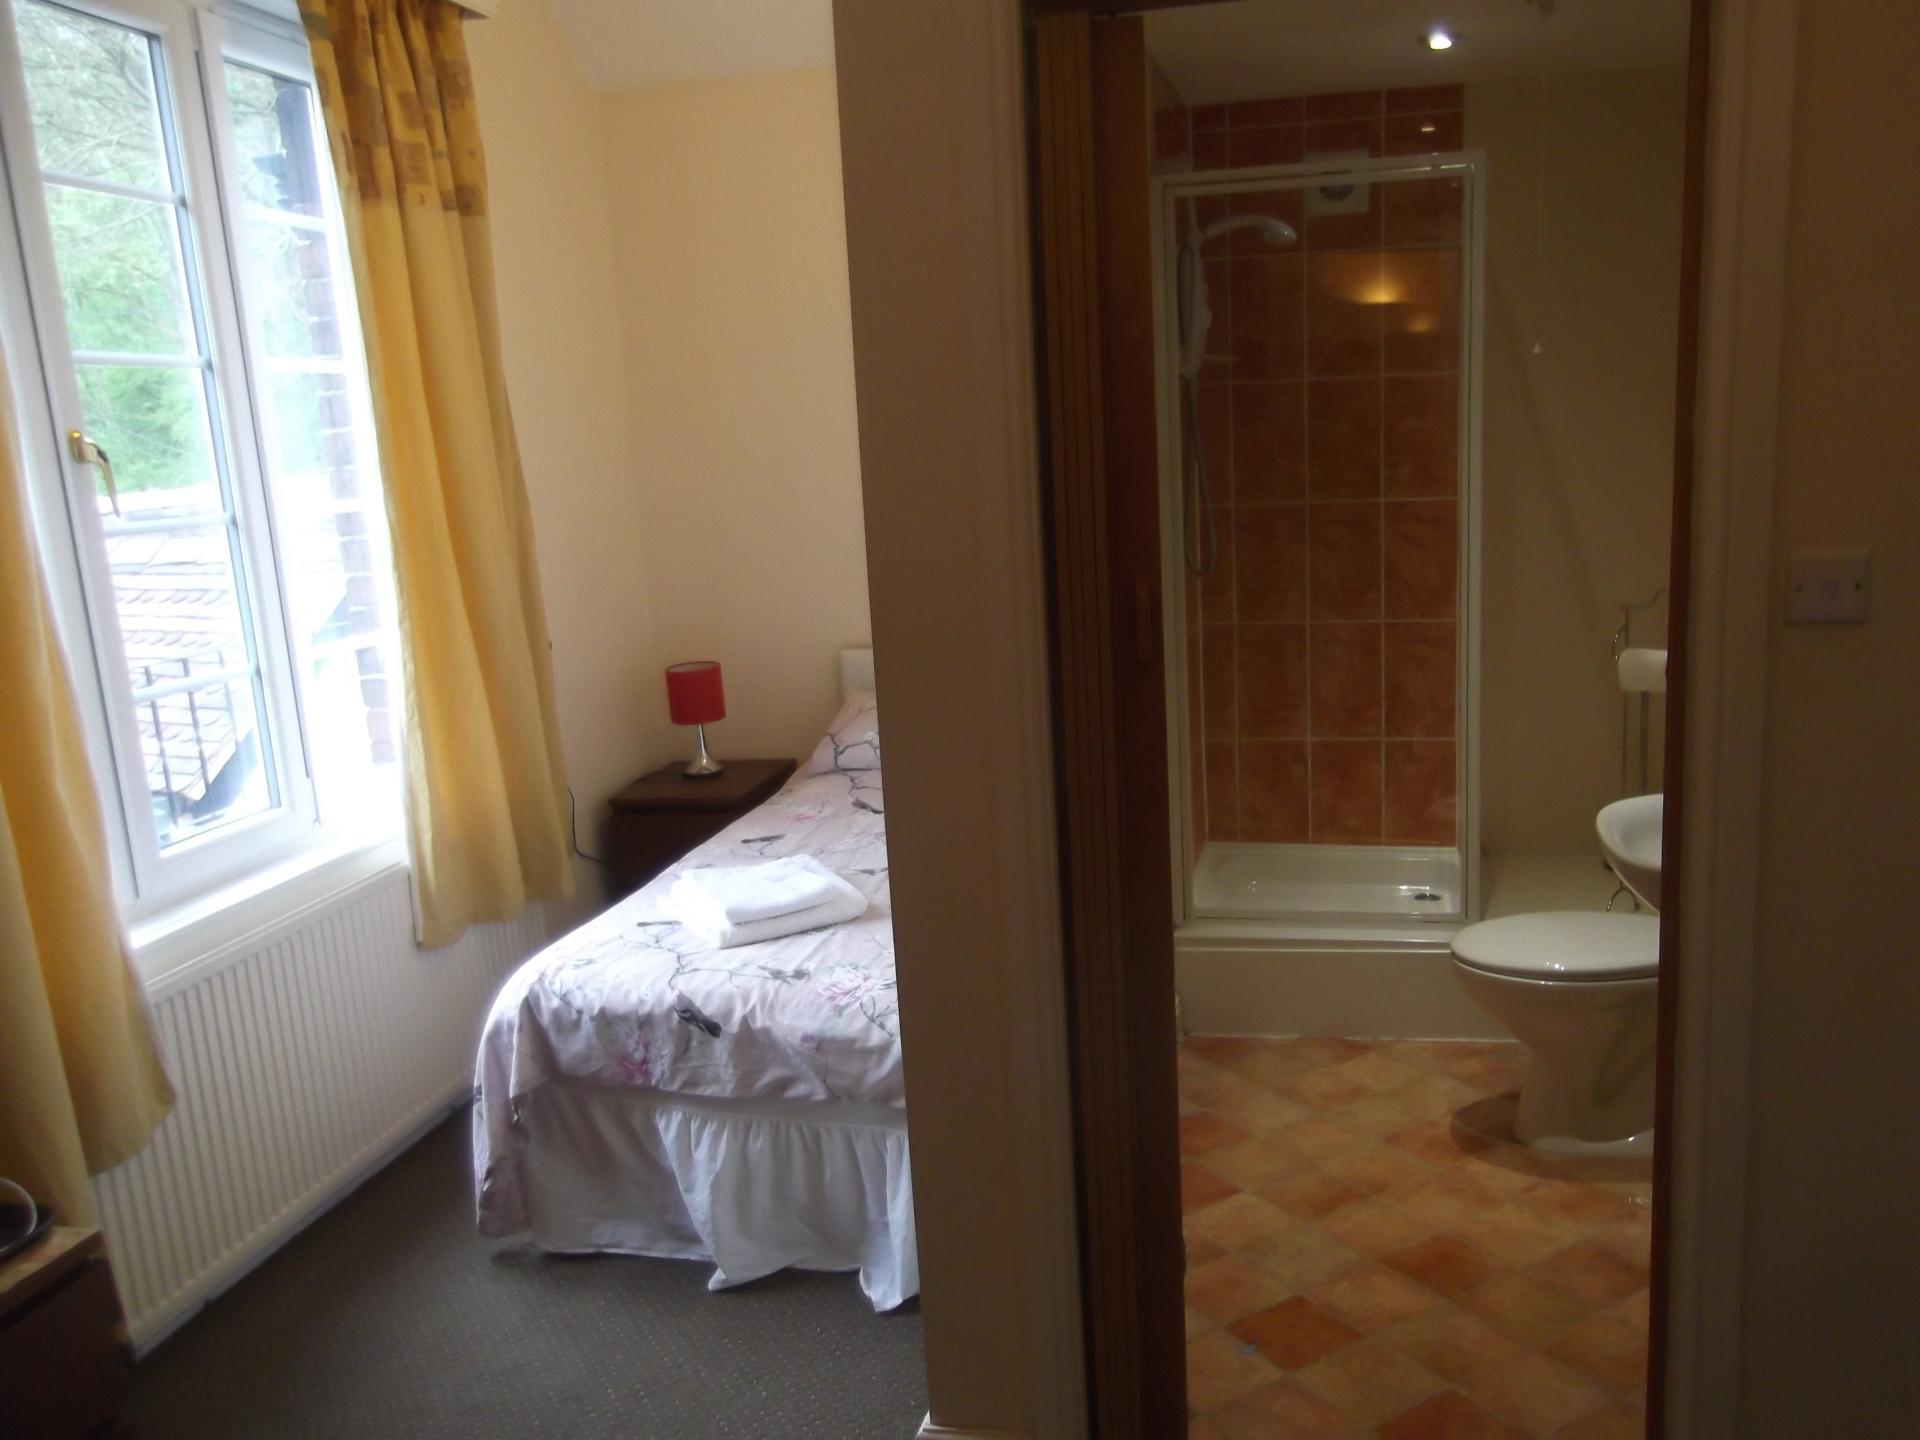 Bed with view of en-suite bathroom